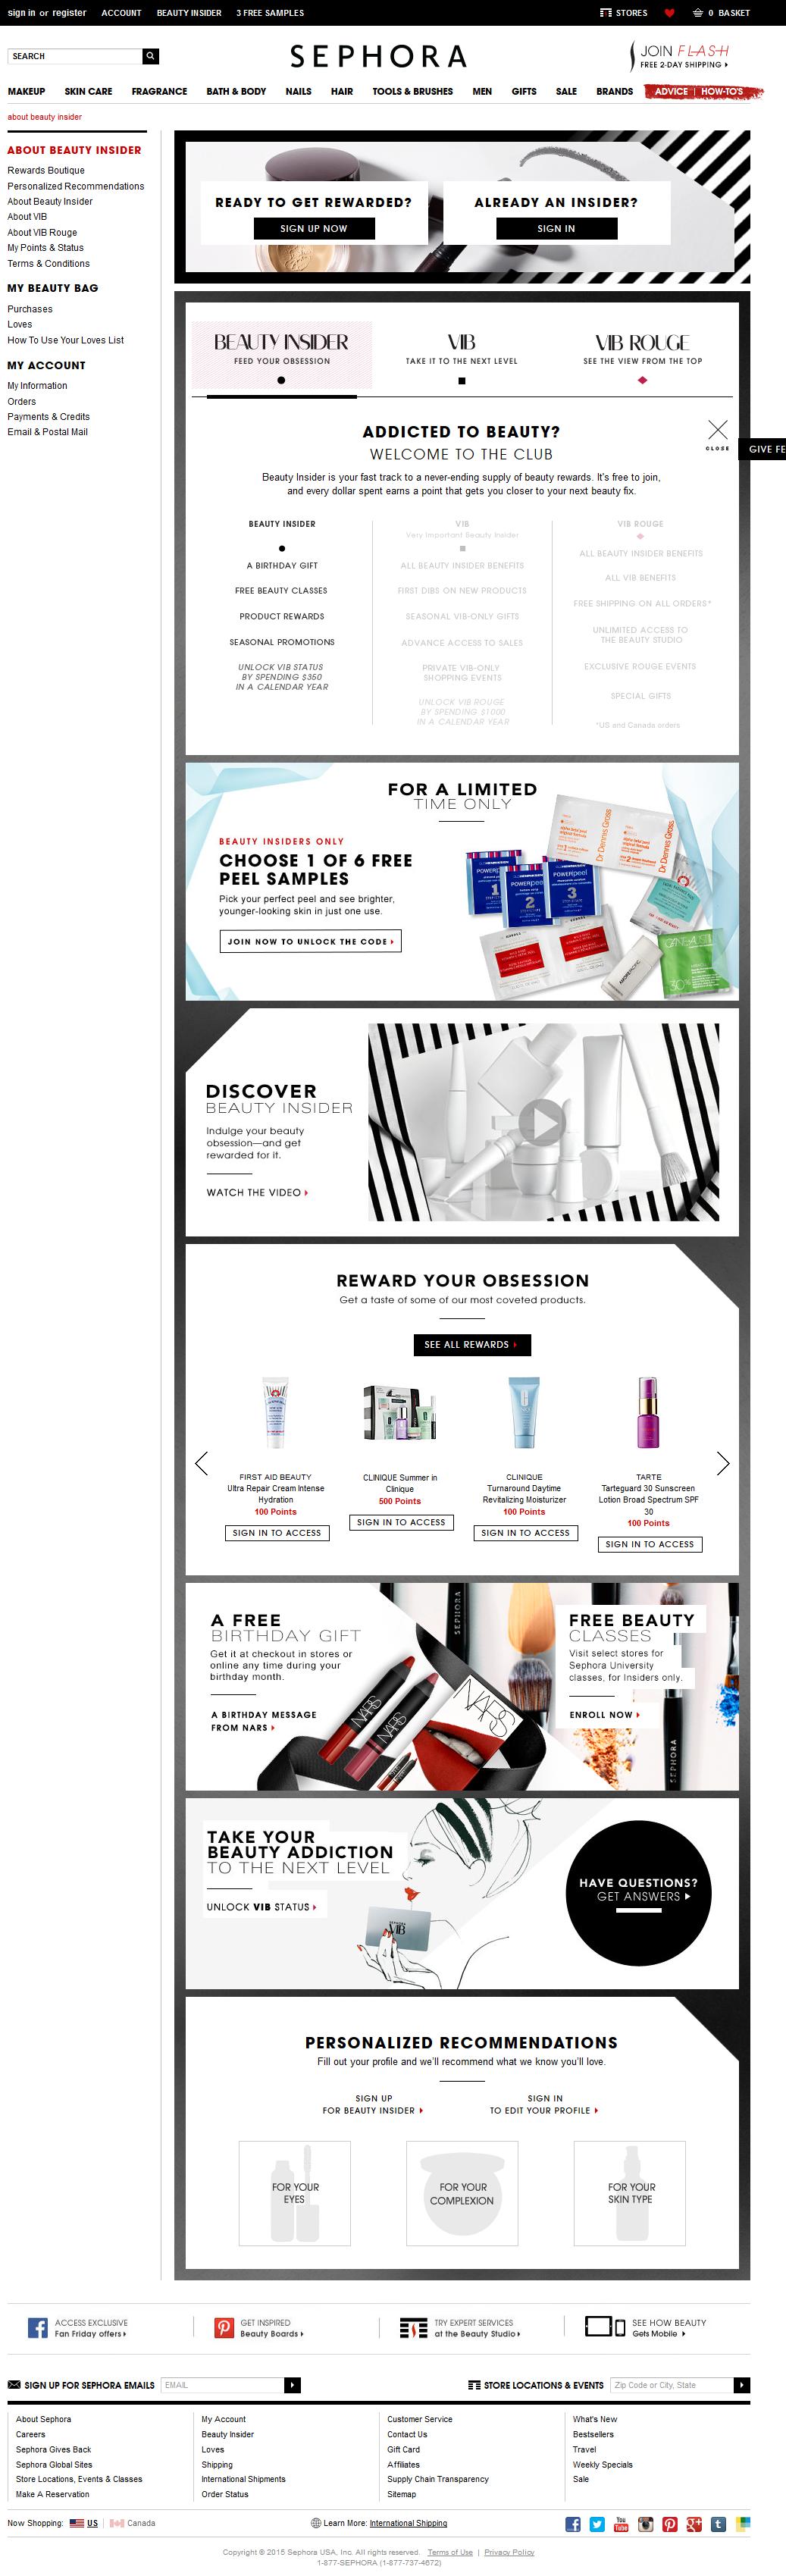 Sephora Beauty Insider Landing Page Sephora Beauty Loyalty Marketing Sephora